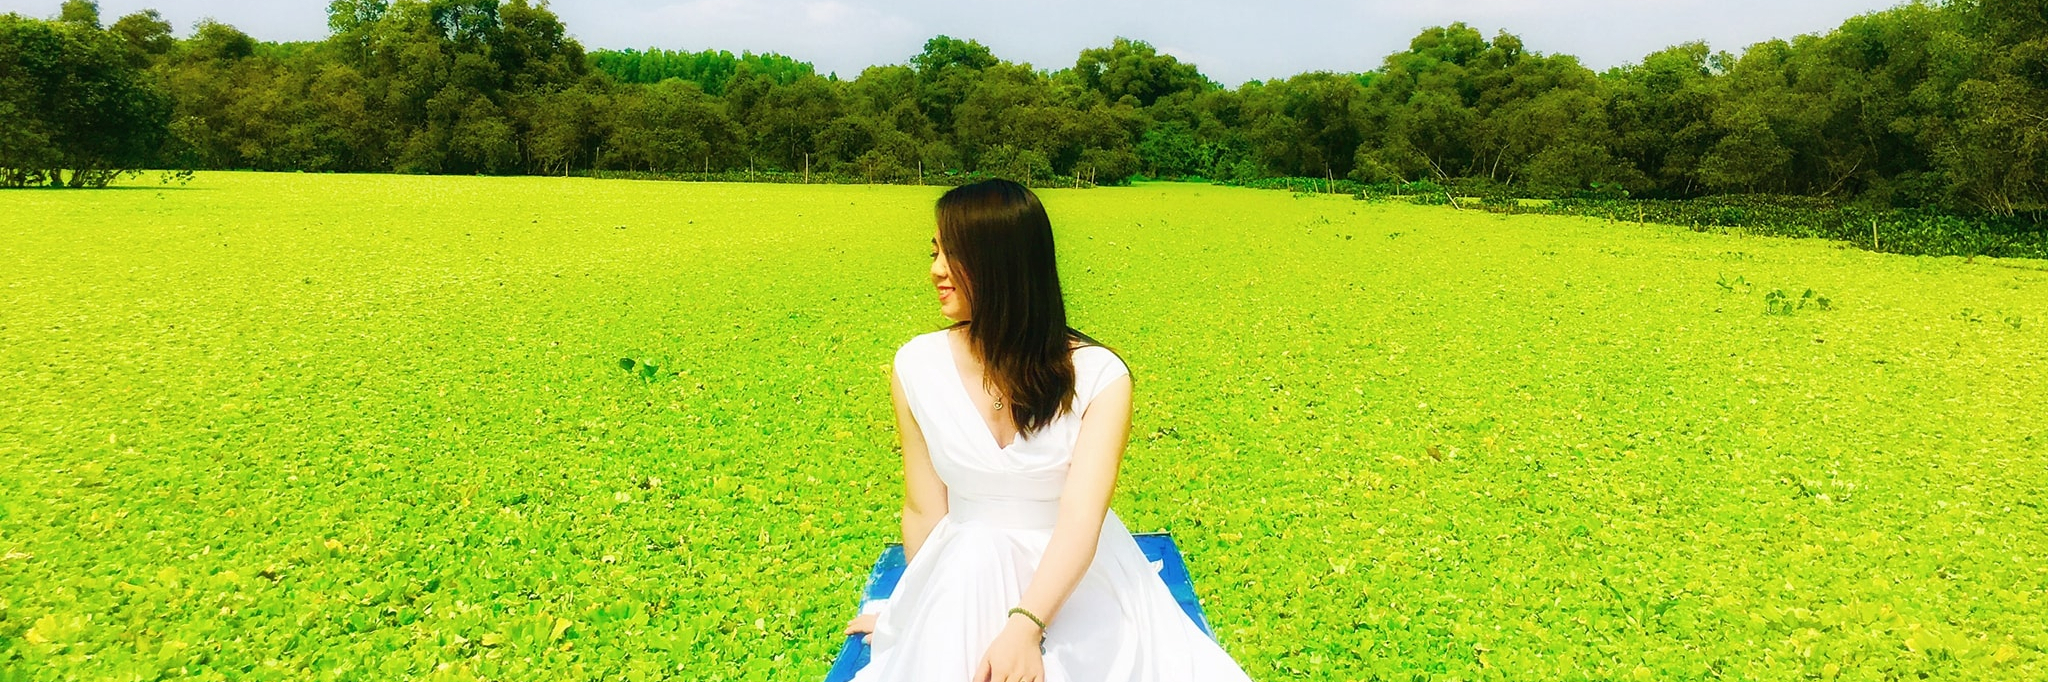 https://gody.vn/blog/quangminh7220/post/thanh-xuan-phai-check-in-5-dia-diem-ngoi-thuyet-dep-nhat-viet-nam-8444